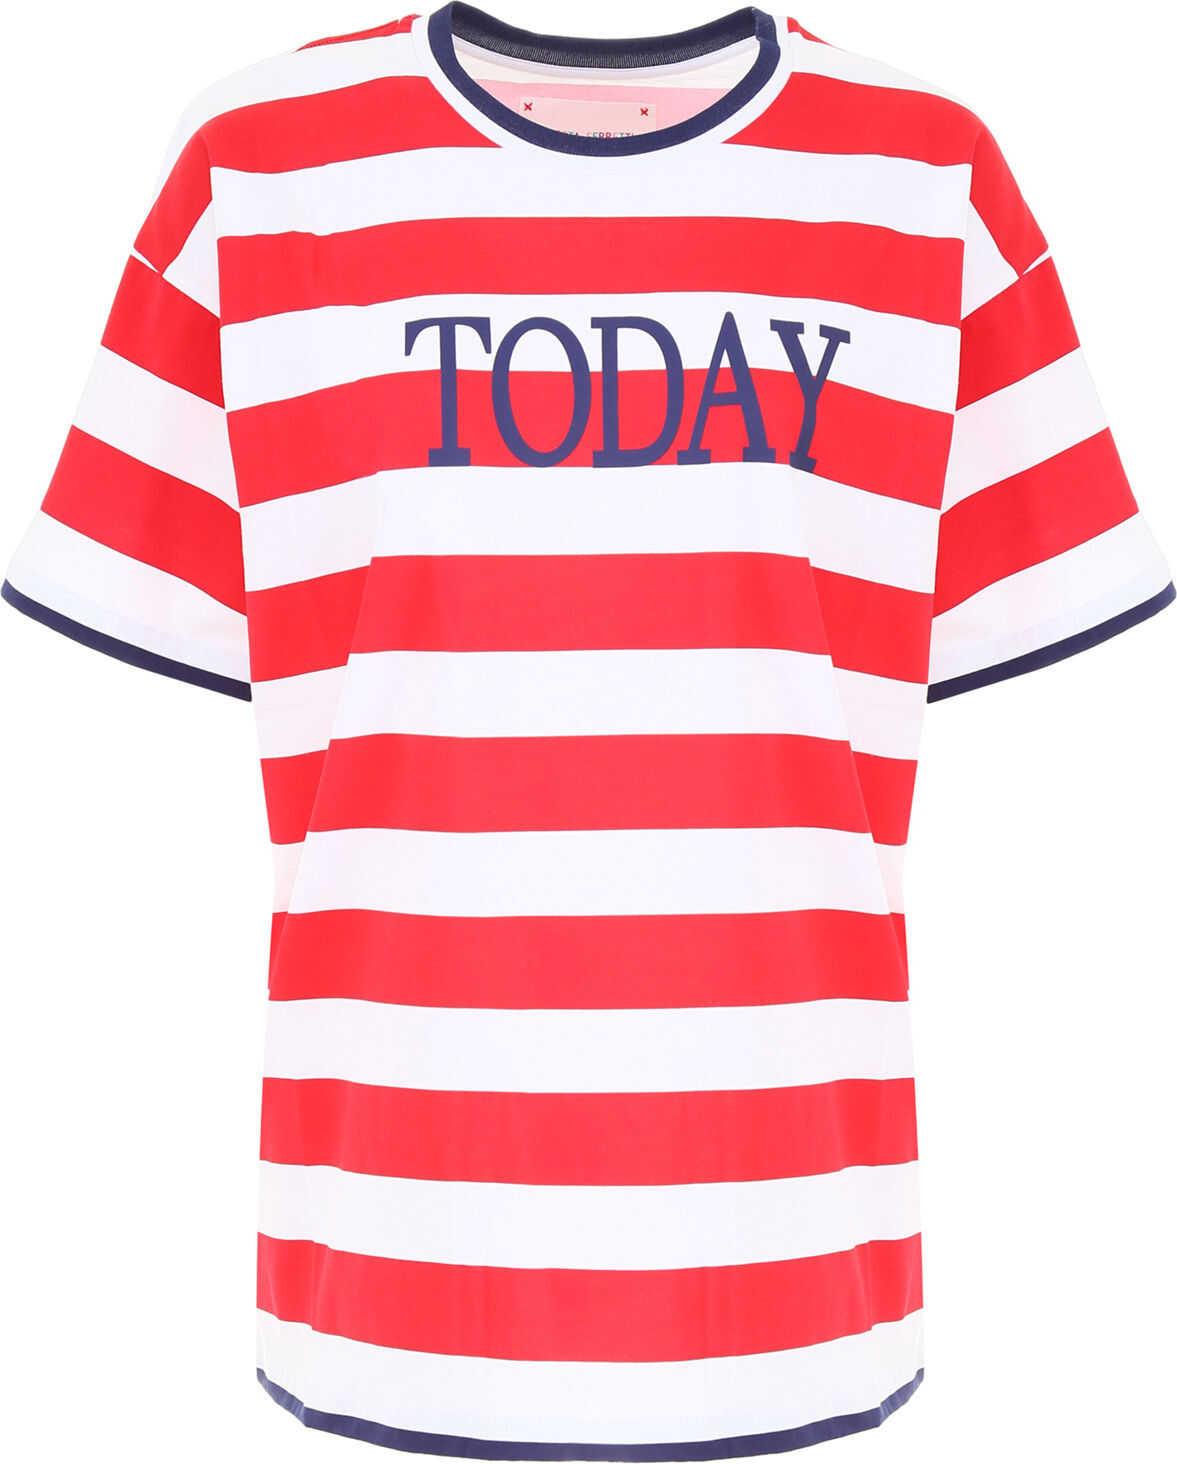 Alberta Ferretti Today T-Shirt WHT RED